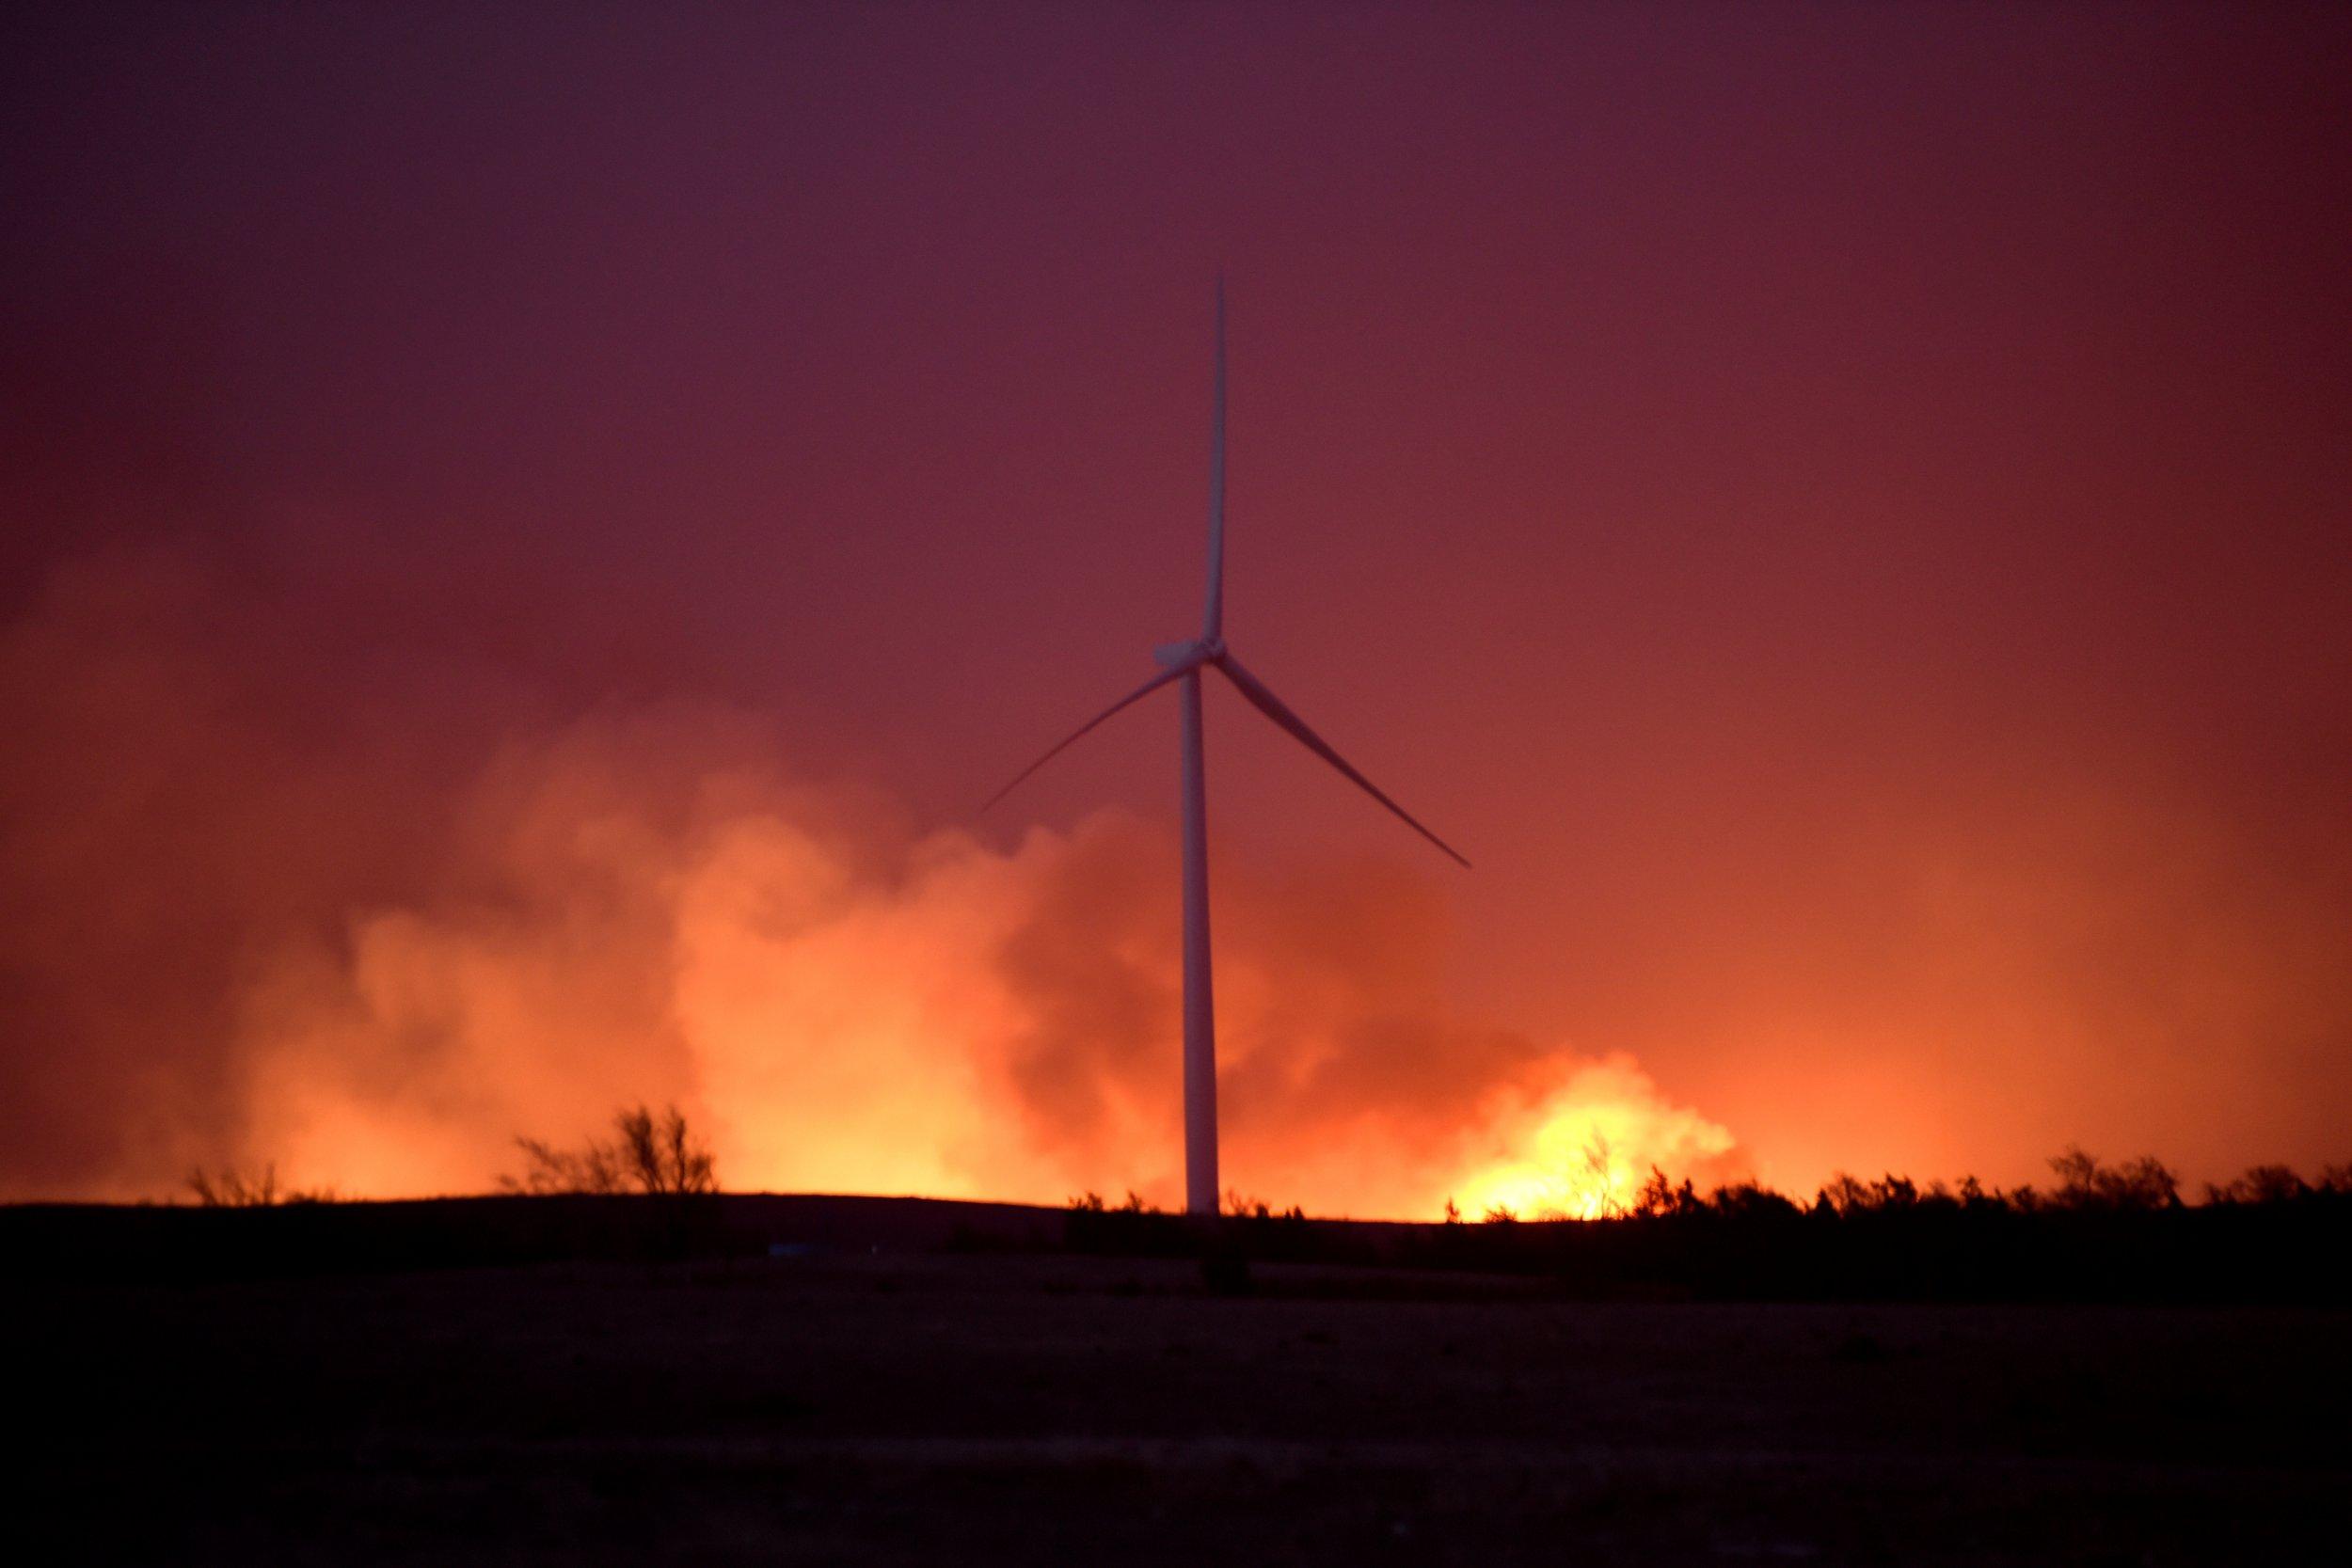 Rhea Fire Map.Oklahoma Rhea Fire Pictures Show 253 000 Acre Wildfire Near Seiling